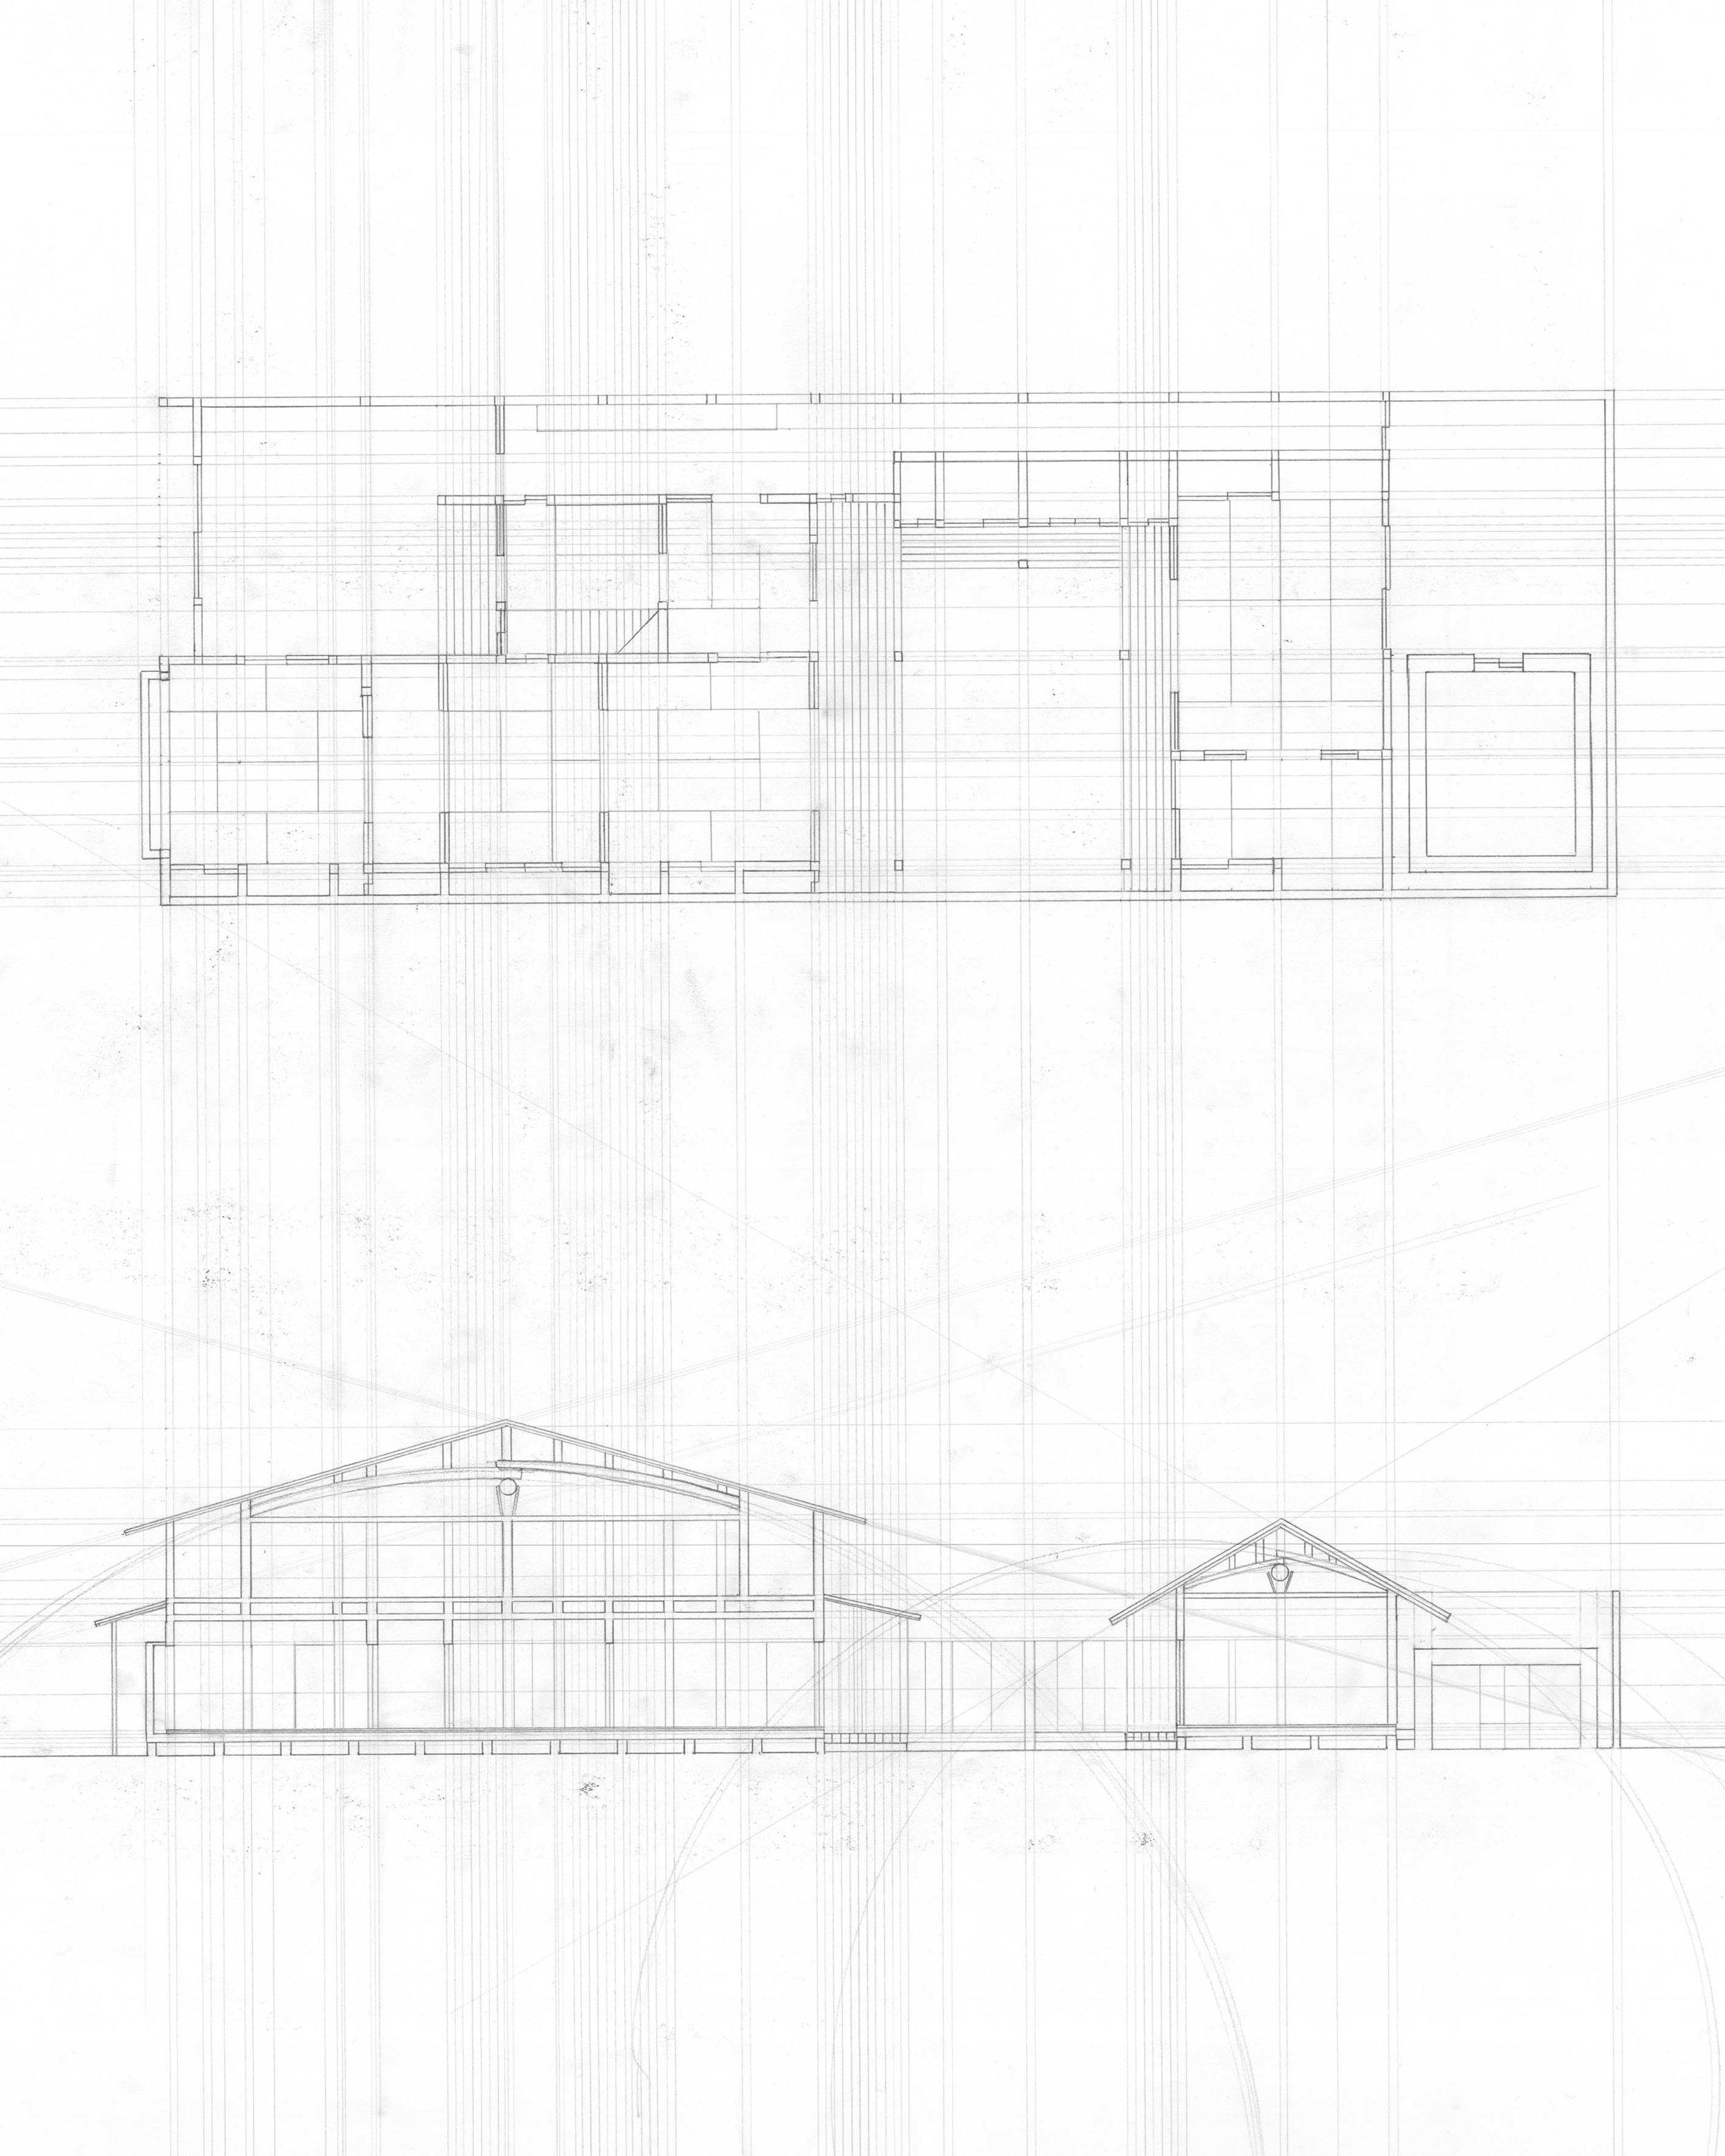 TYPICA LONG PLAN MACHIYA HOUSE